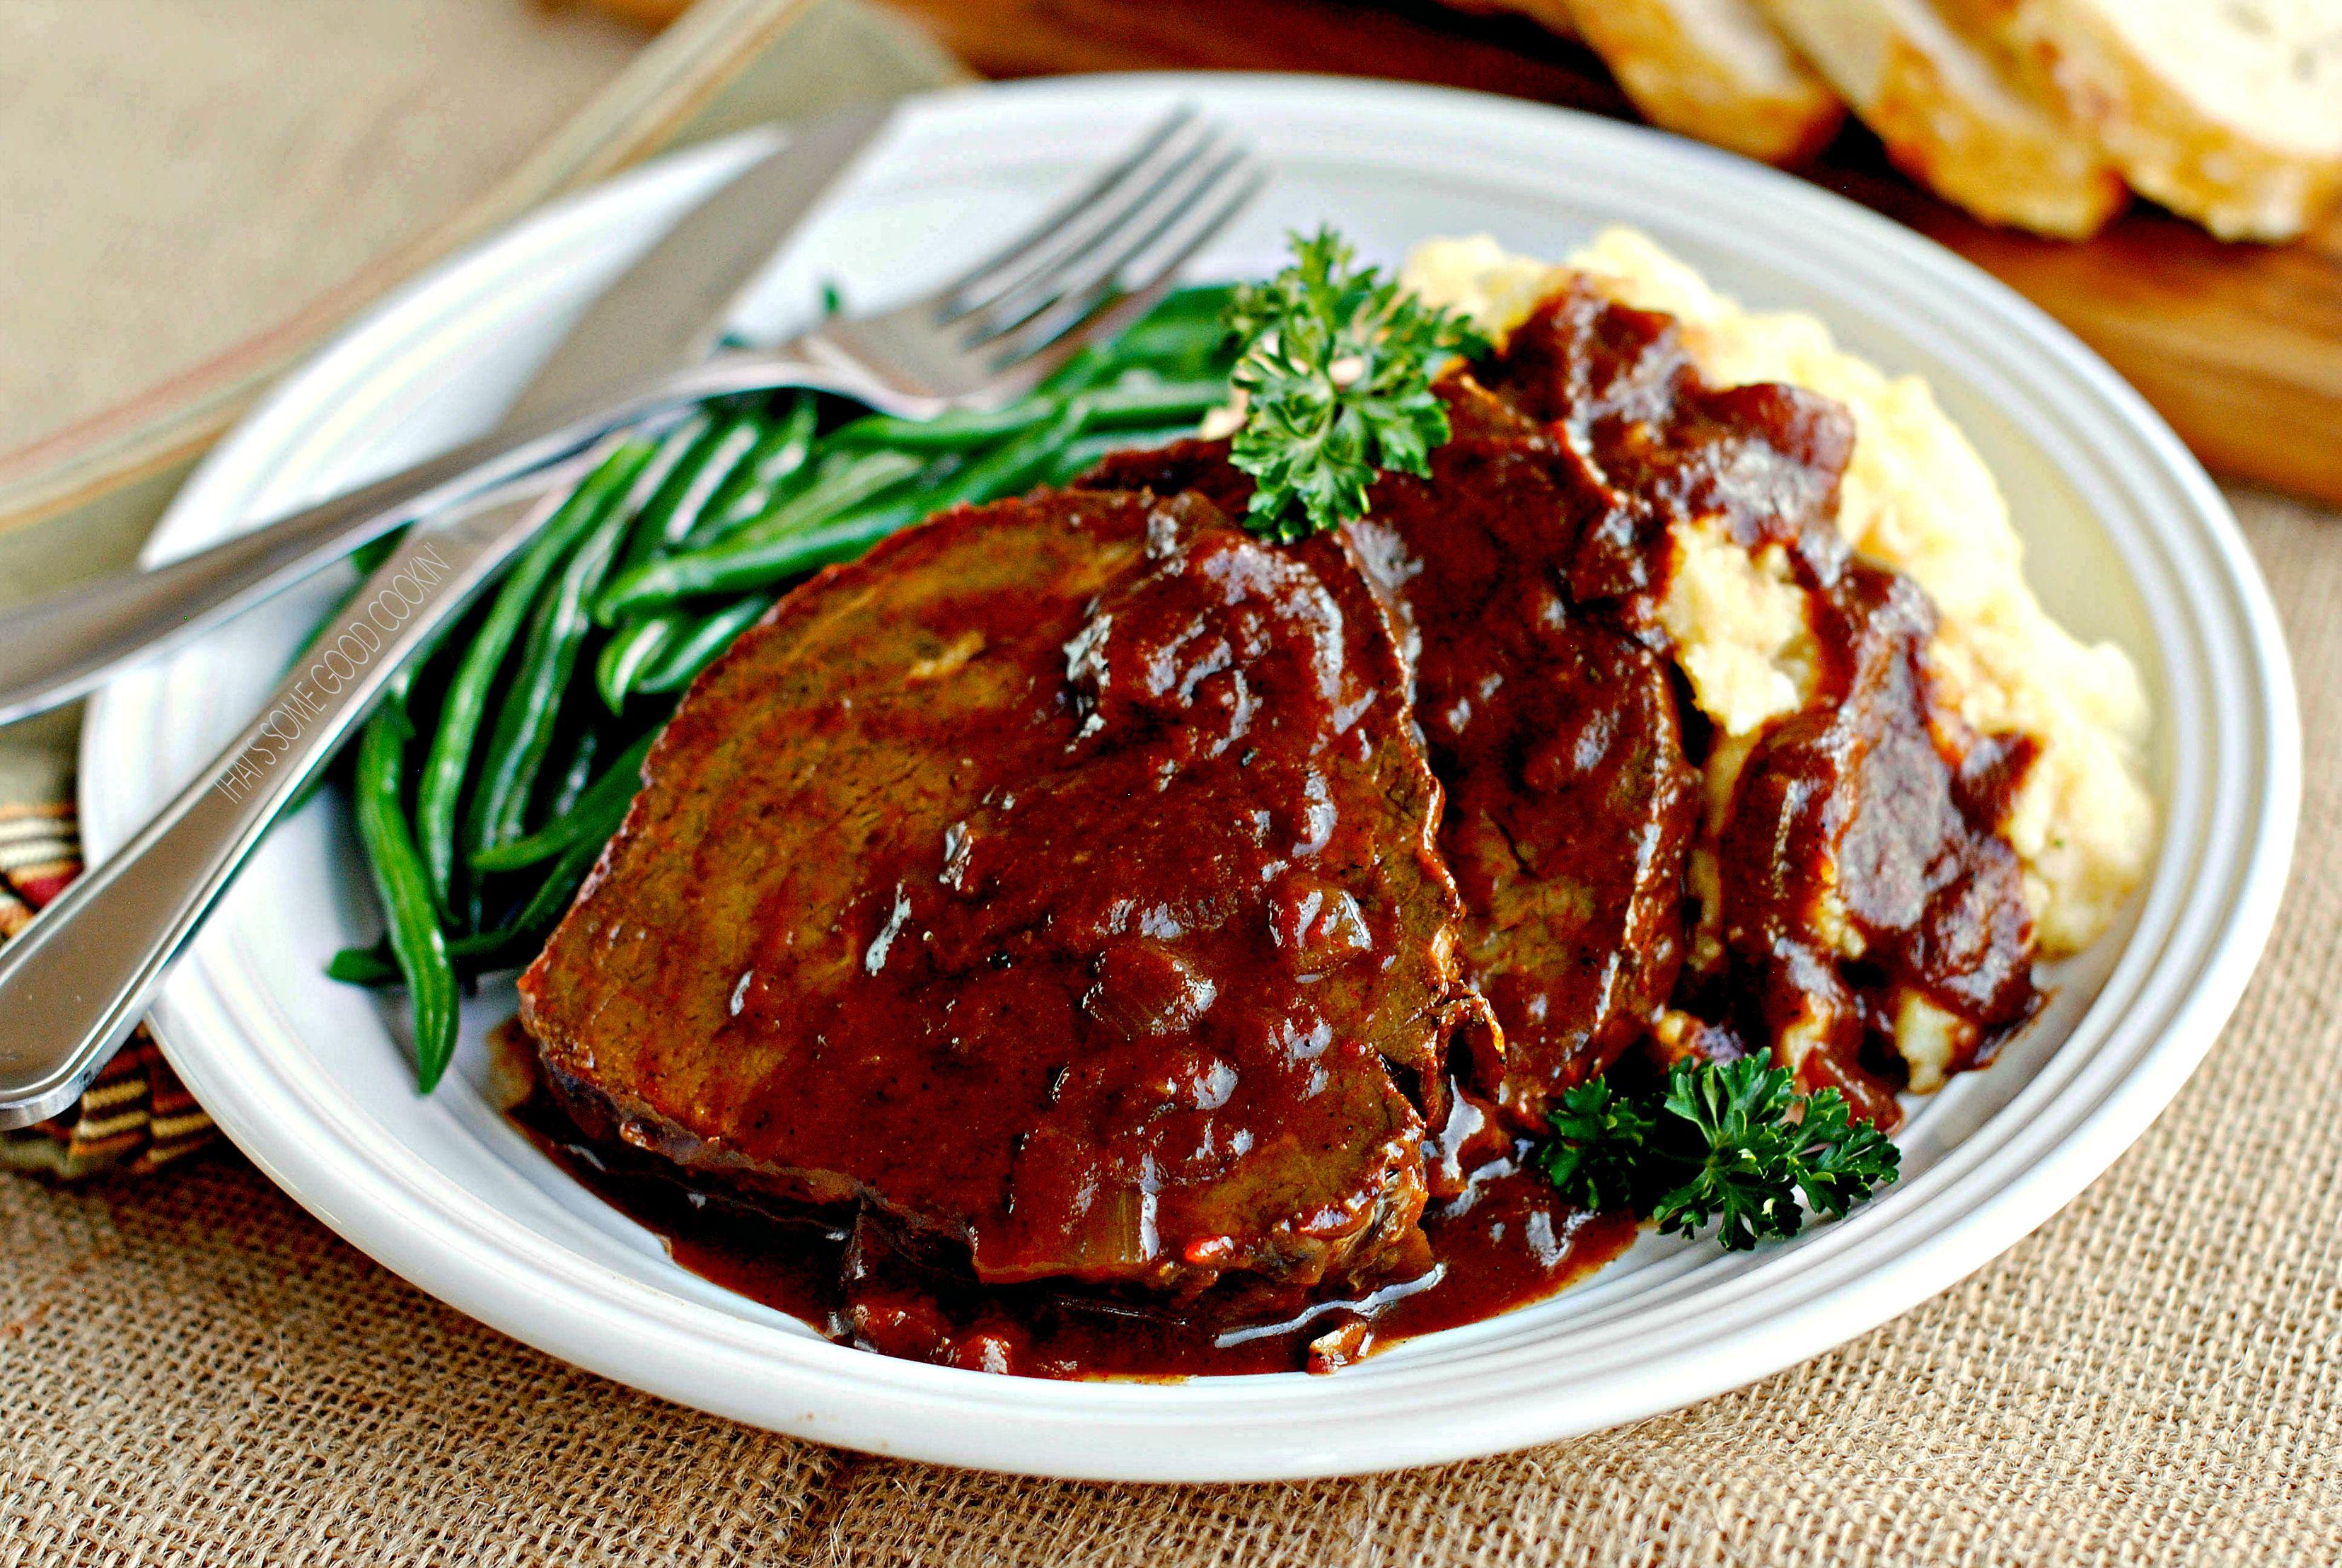 German Style Pot Roast Sauerbraten Recipe Pot Roast Pork Roast Crock Pot Recipes Recipes